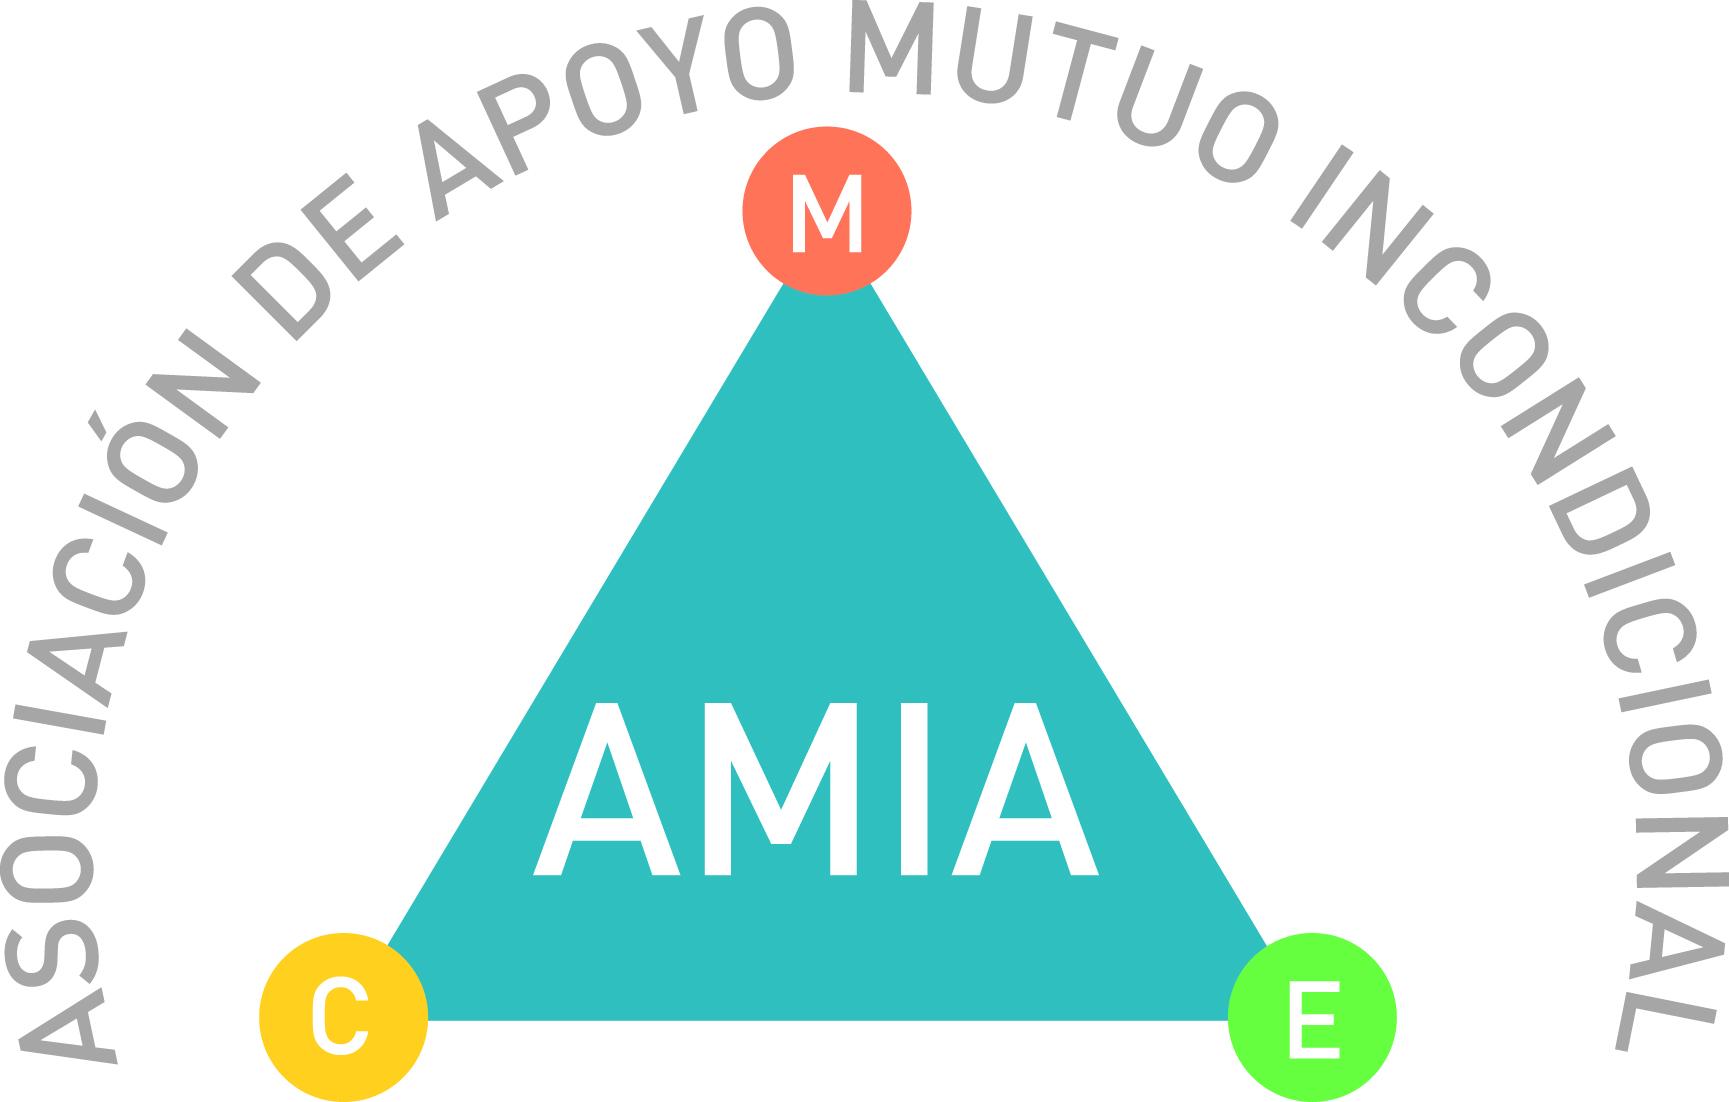 AMIA Apoyo mutuo Incondicional Alcobendas